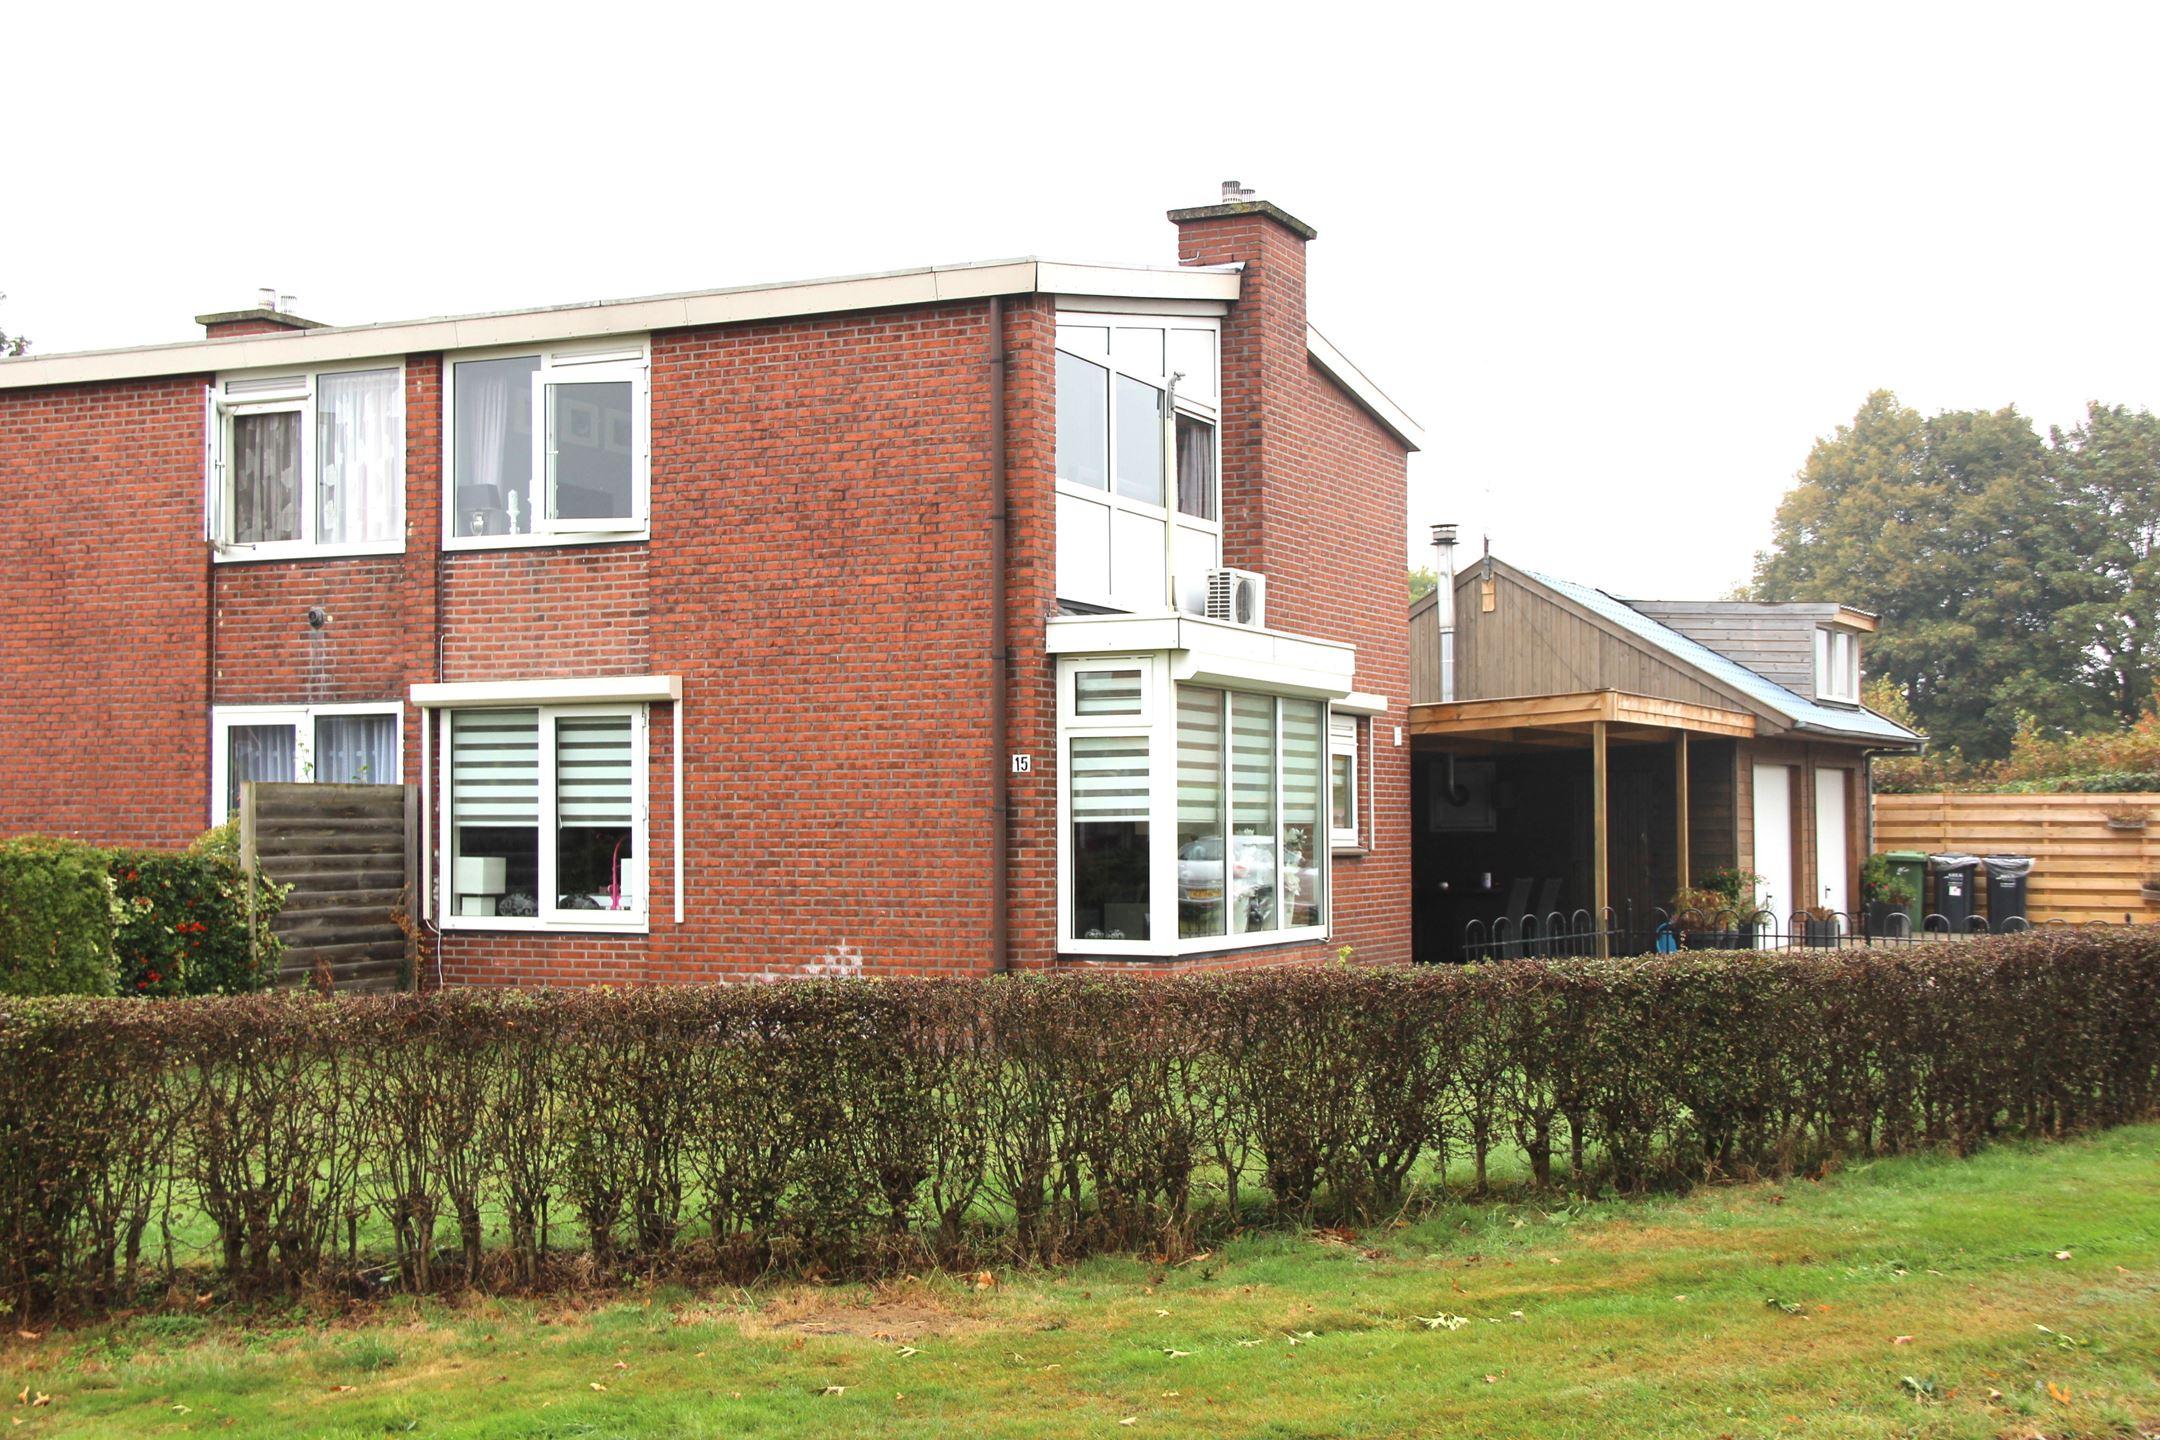 Verkocht ring 15 7833 ek nieuw amsterdam funda for Funda dubbele bewoning